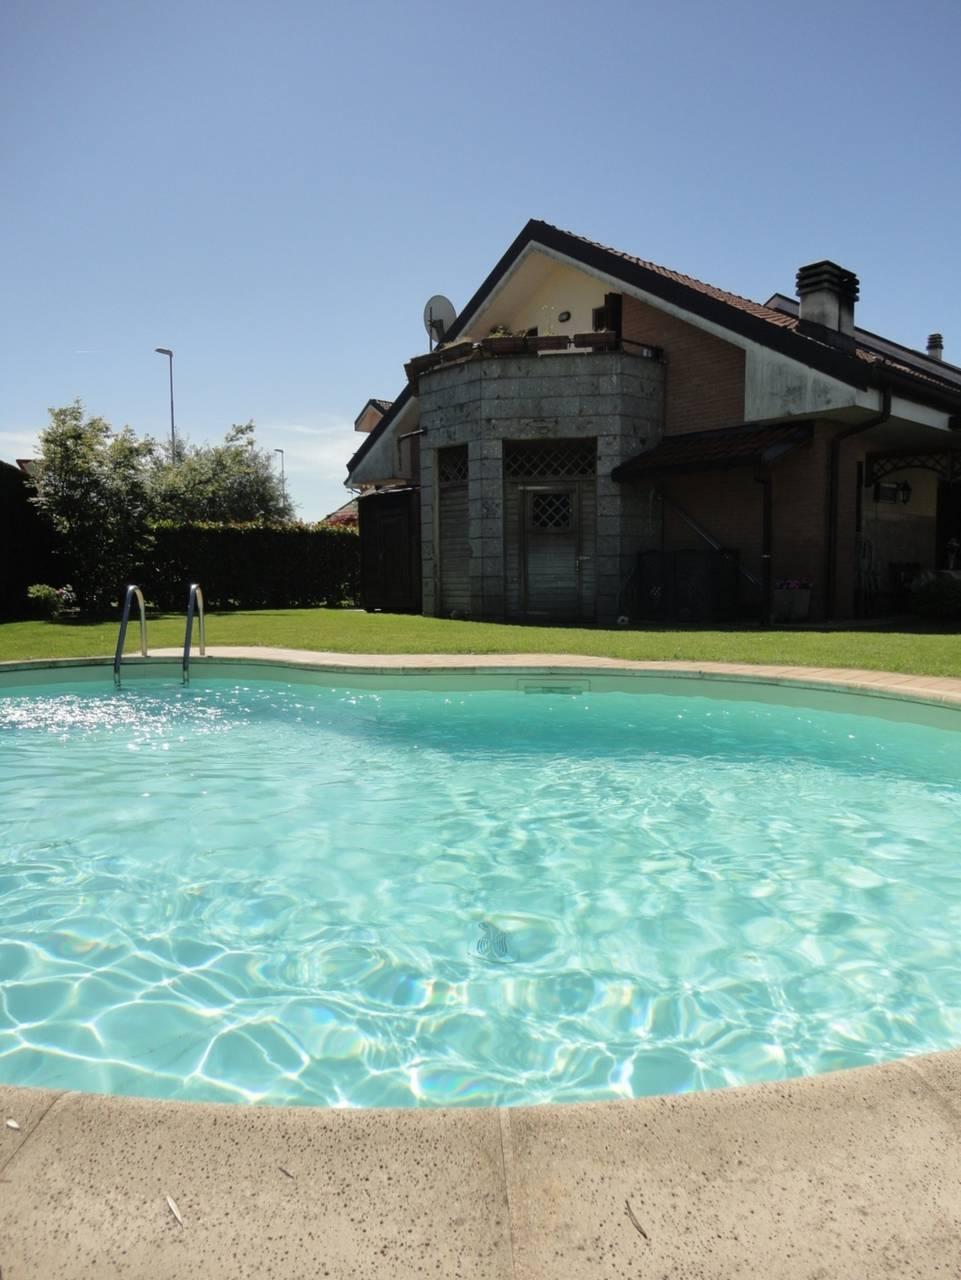 Villa-con-piscina-in-vendita-a-Busnago-in-Brianza-6